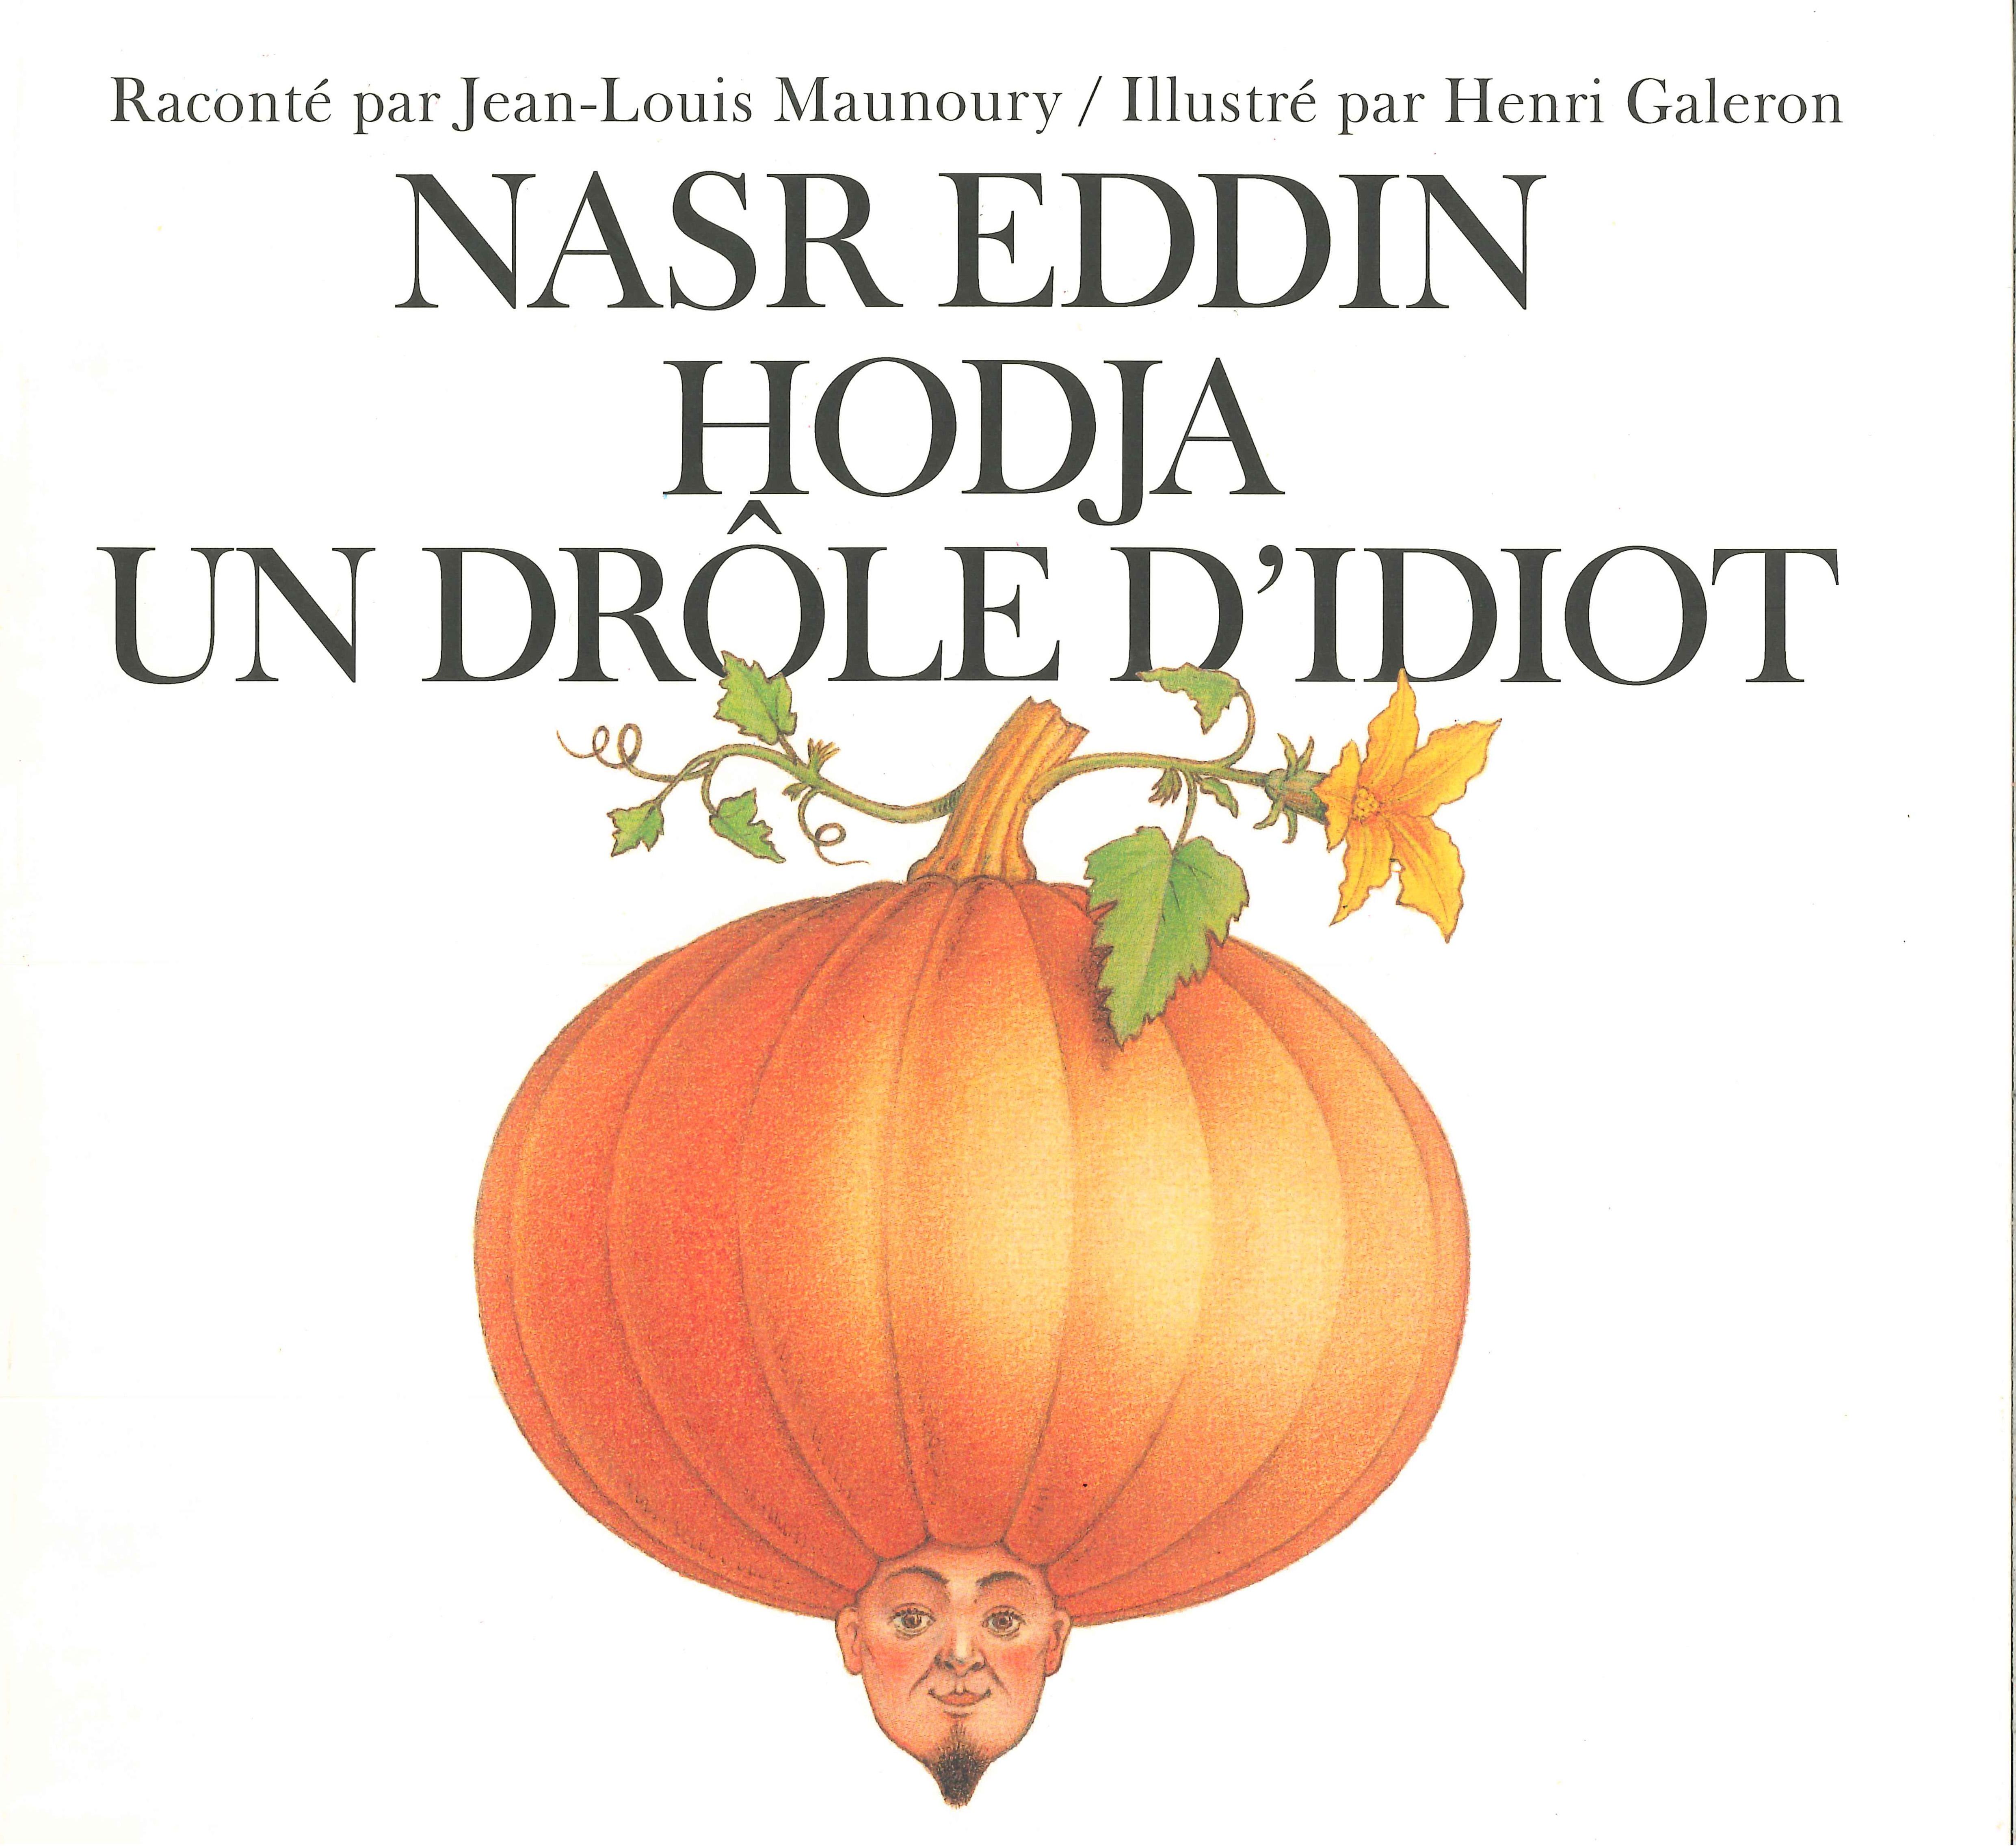 Nasr Eddin Hodja, a funny idiot